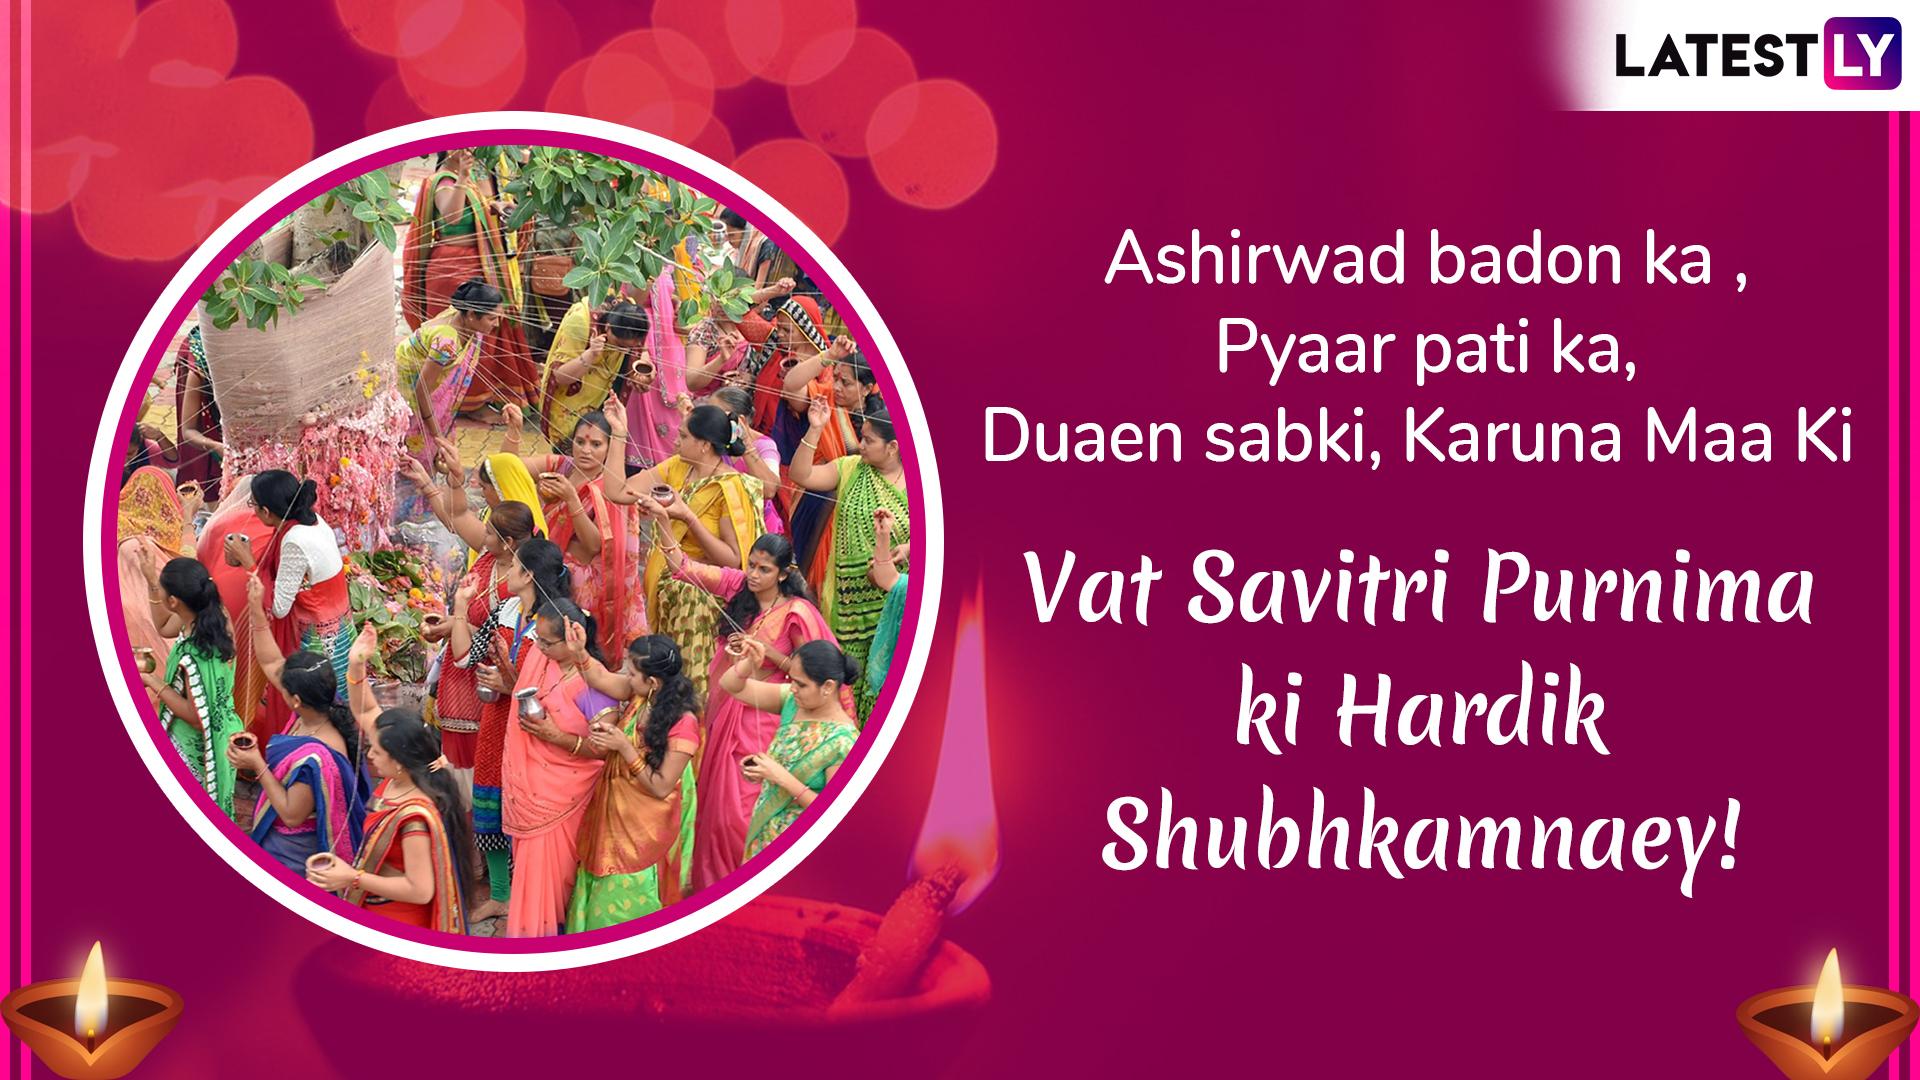 Happy Vat Savitri Puja!